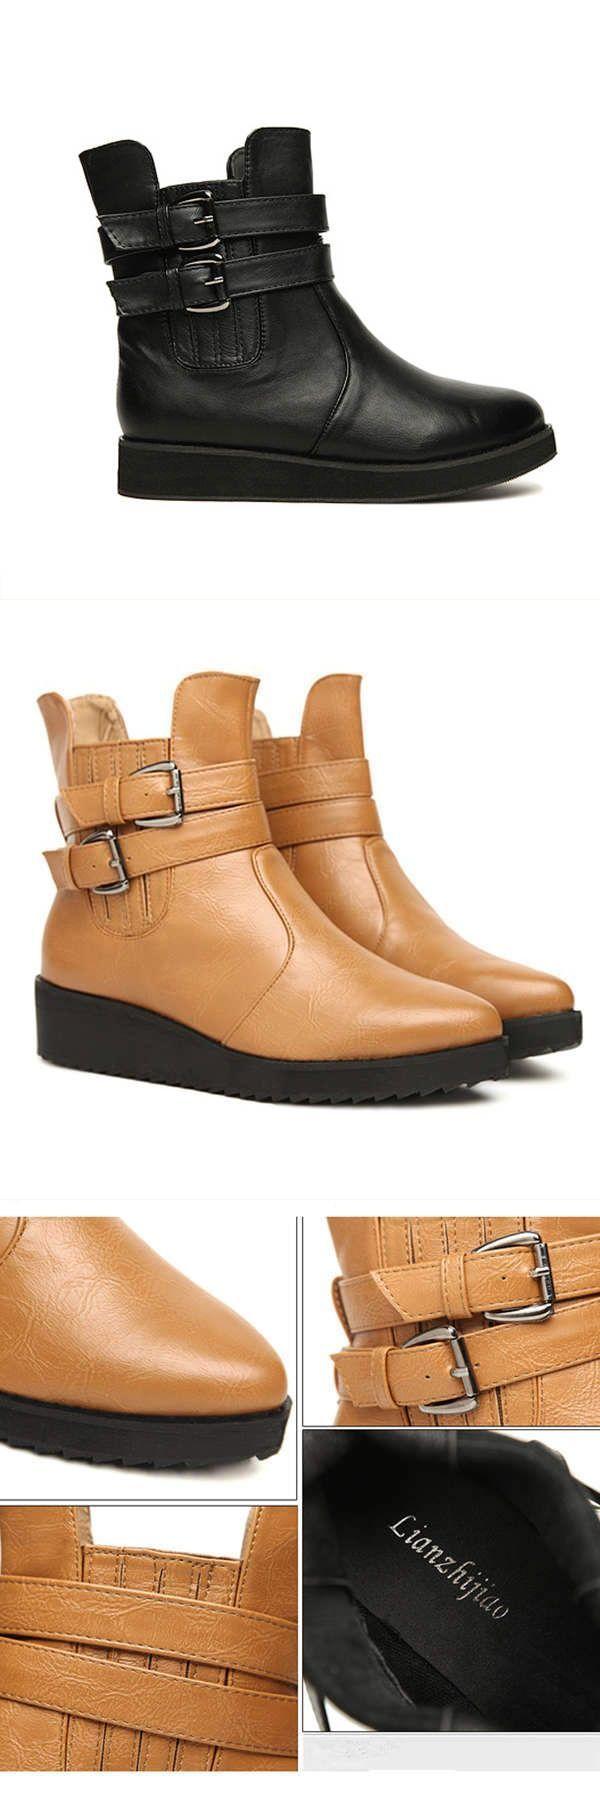 Vintage Buckle Casual Flat Heel Women 8217 S Martin Boots Z Skid Control